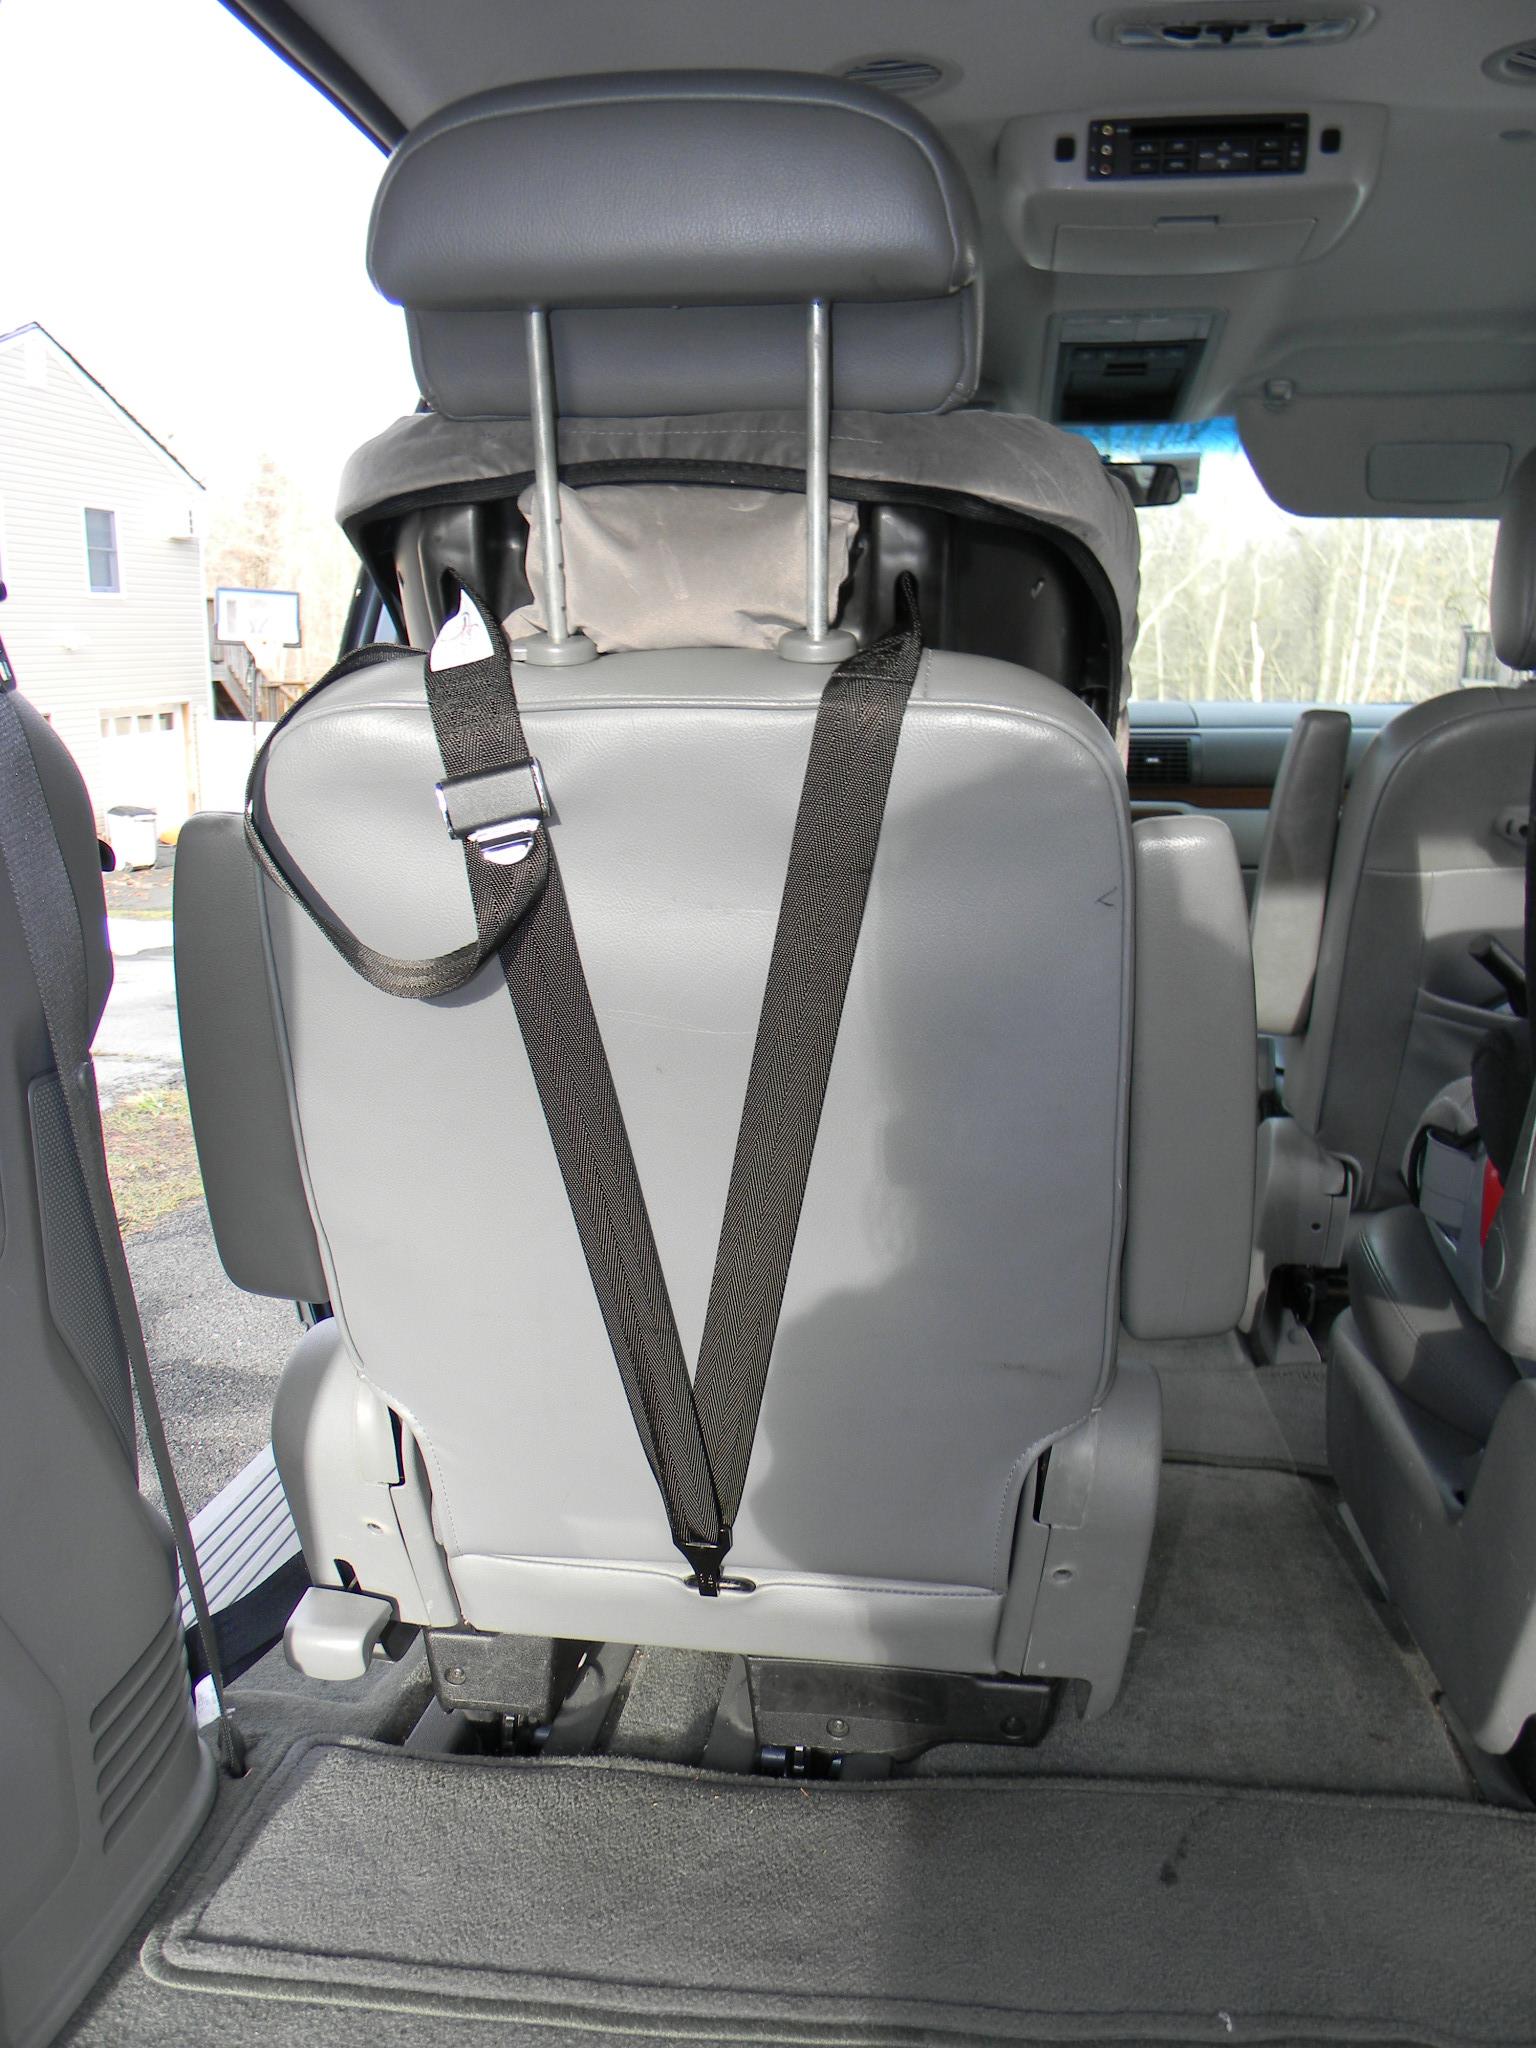 Ford Explorer Car Seat Anchors